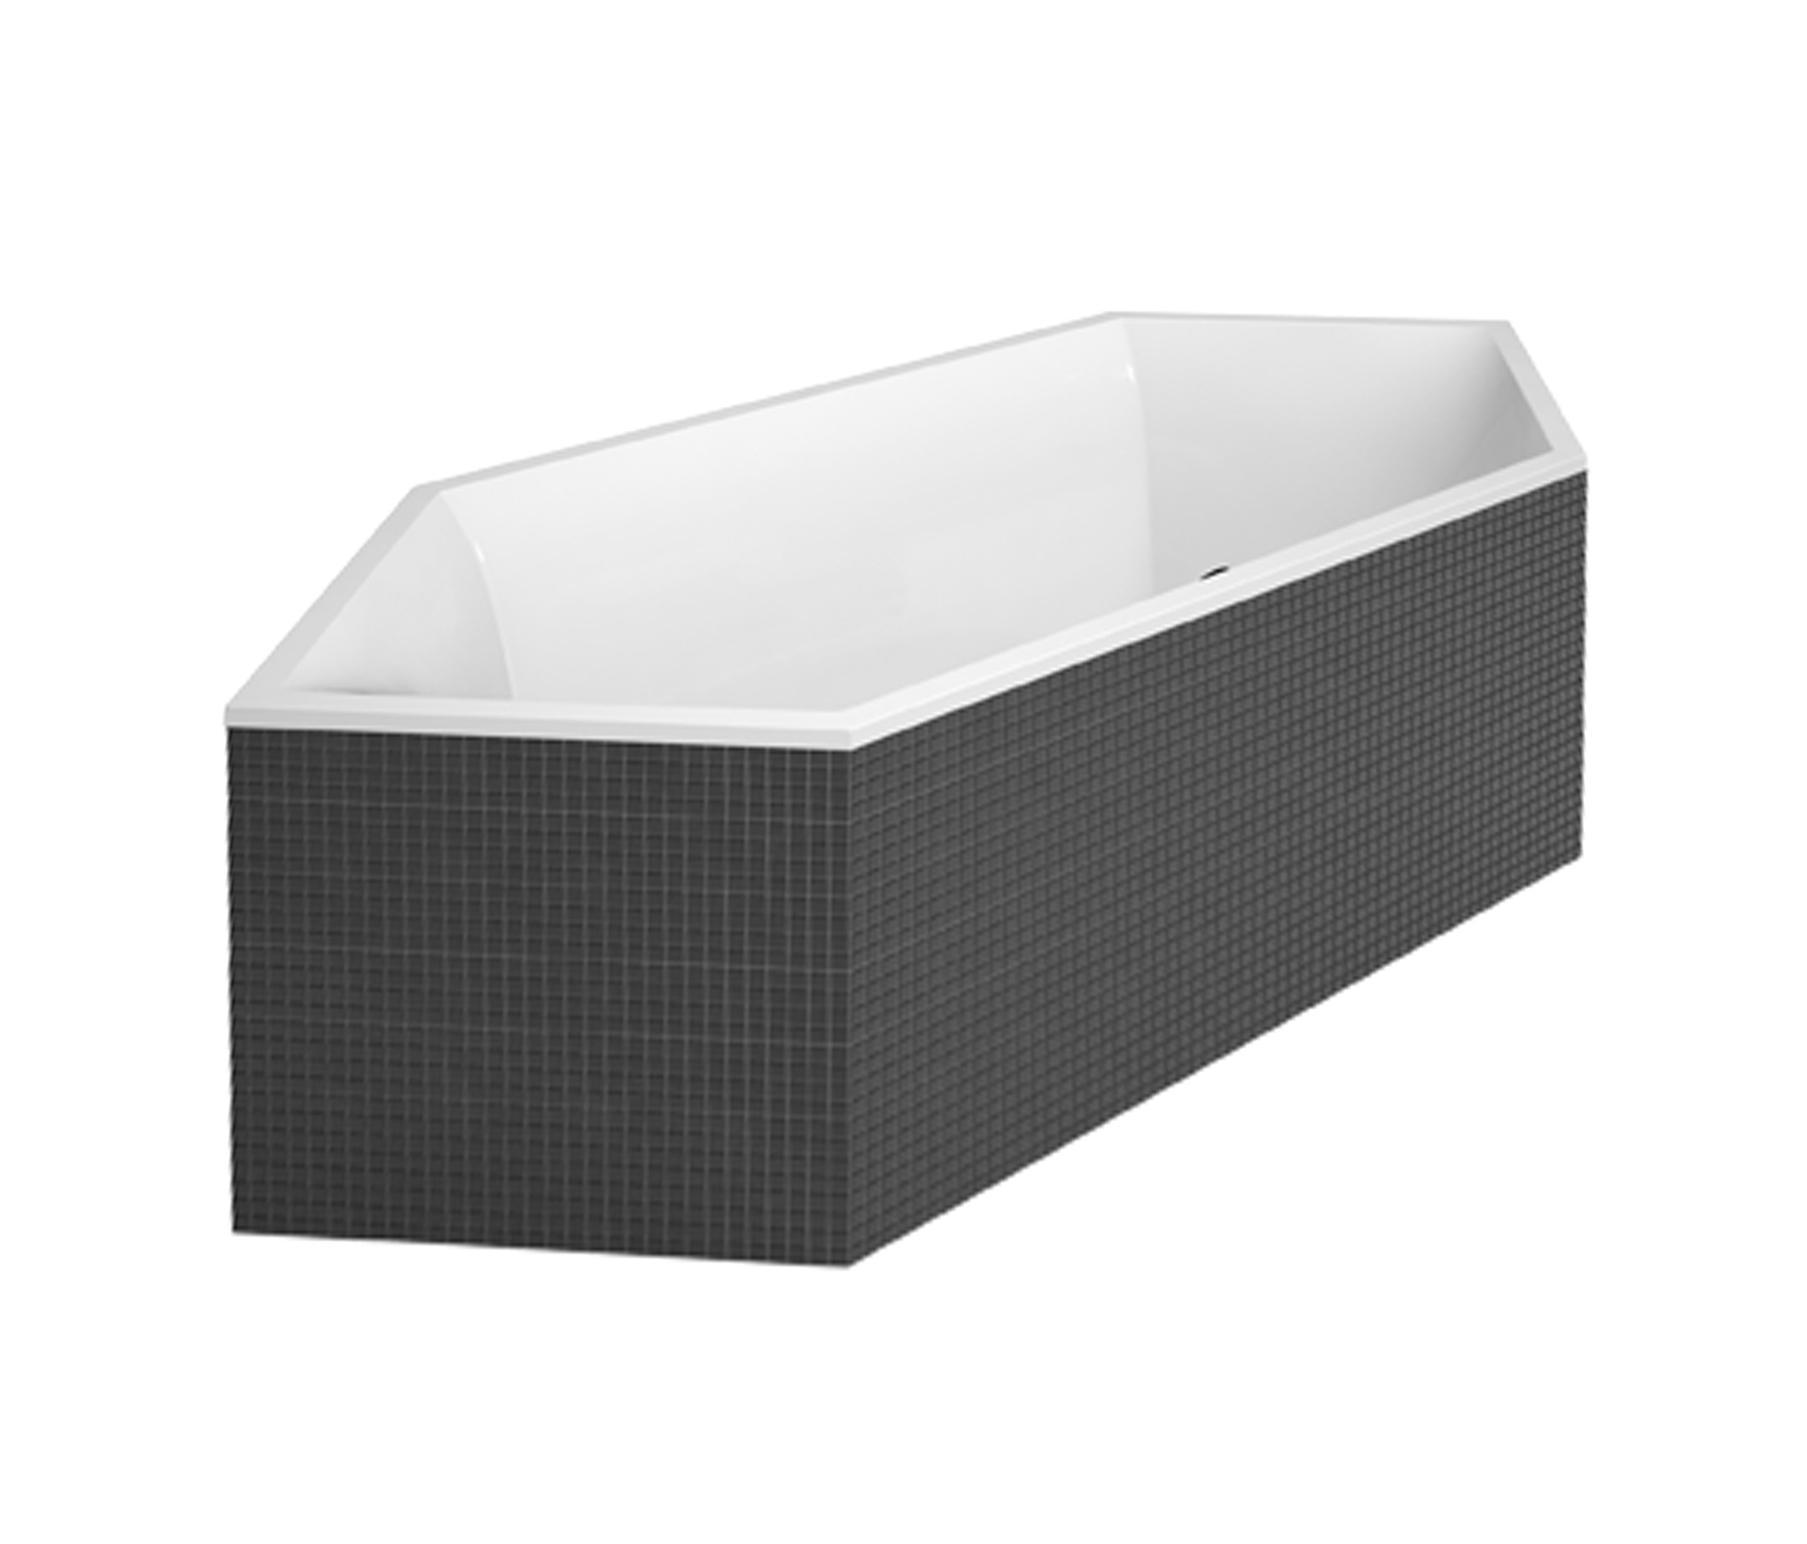 Squaro edge vasca da bagno vasche ad incasso villeroy - Vasca da bagno villeroy e boch ...